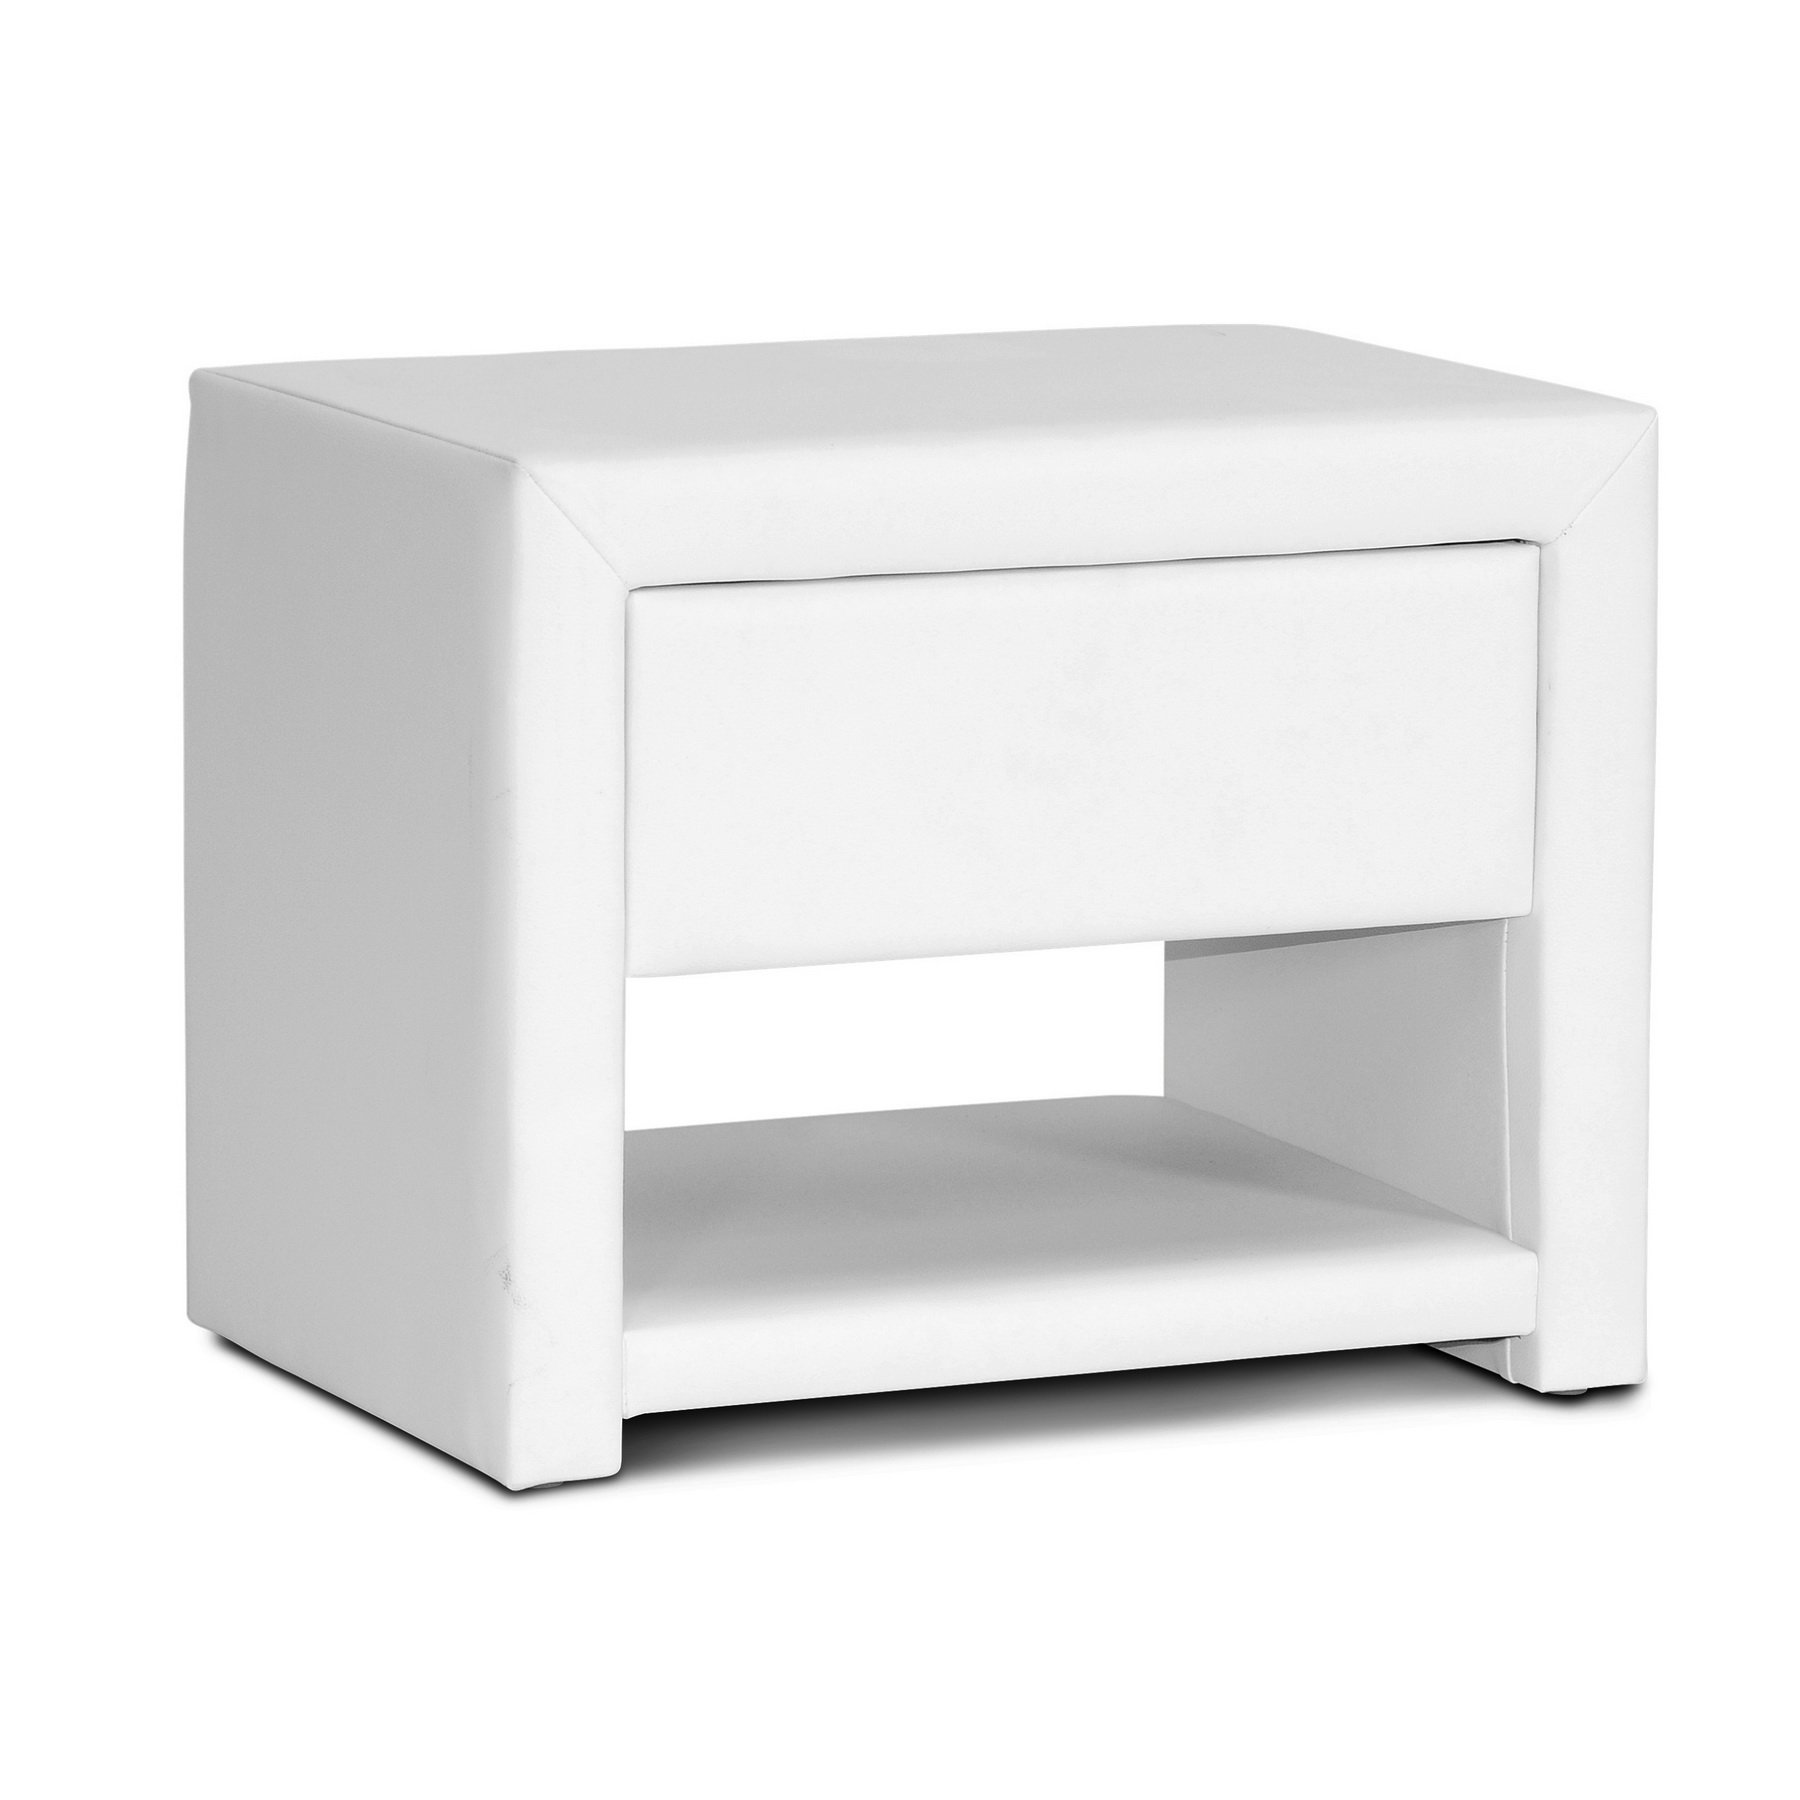 Baxton Studio Massey Upholstered Modern Nightstand, White by Baxton Studio